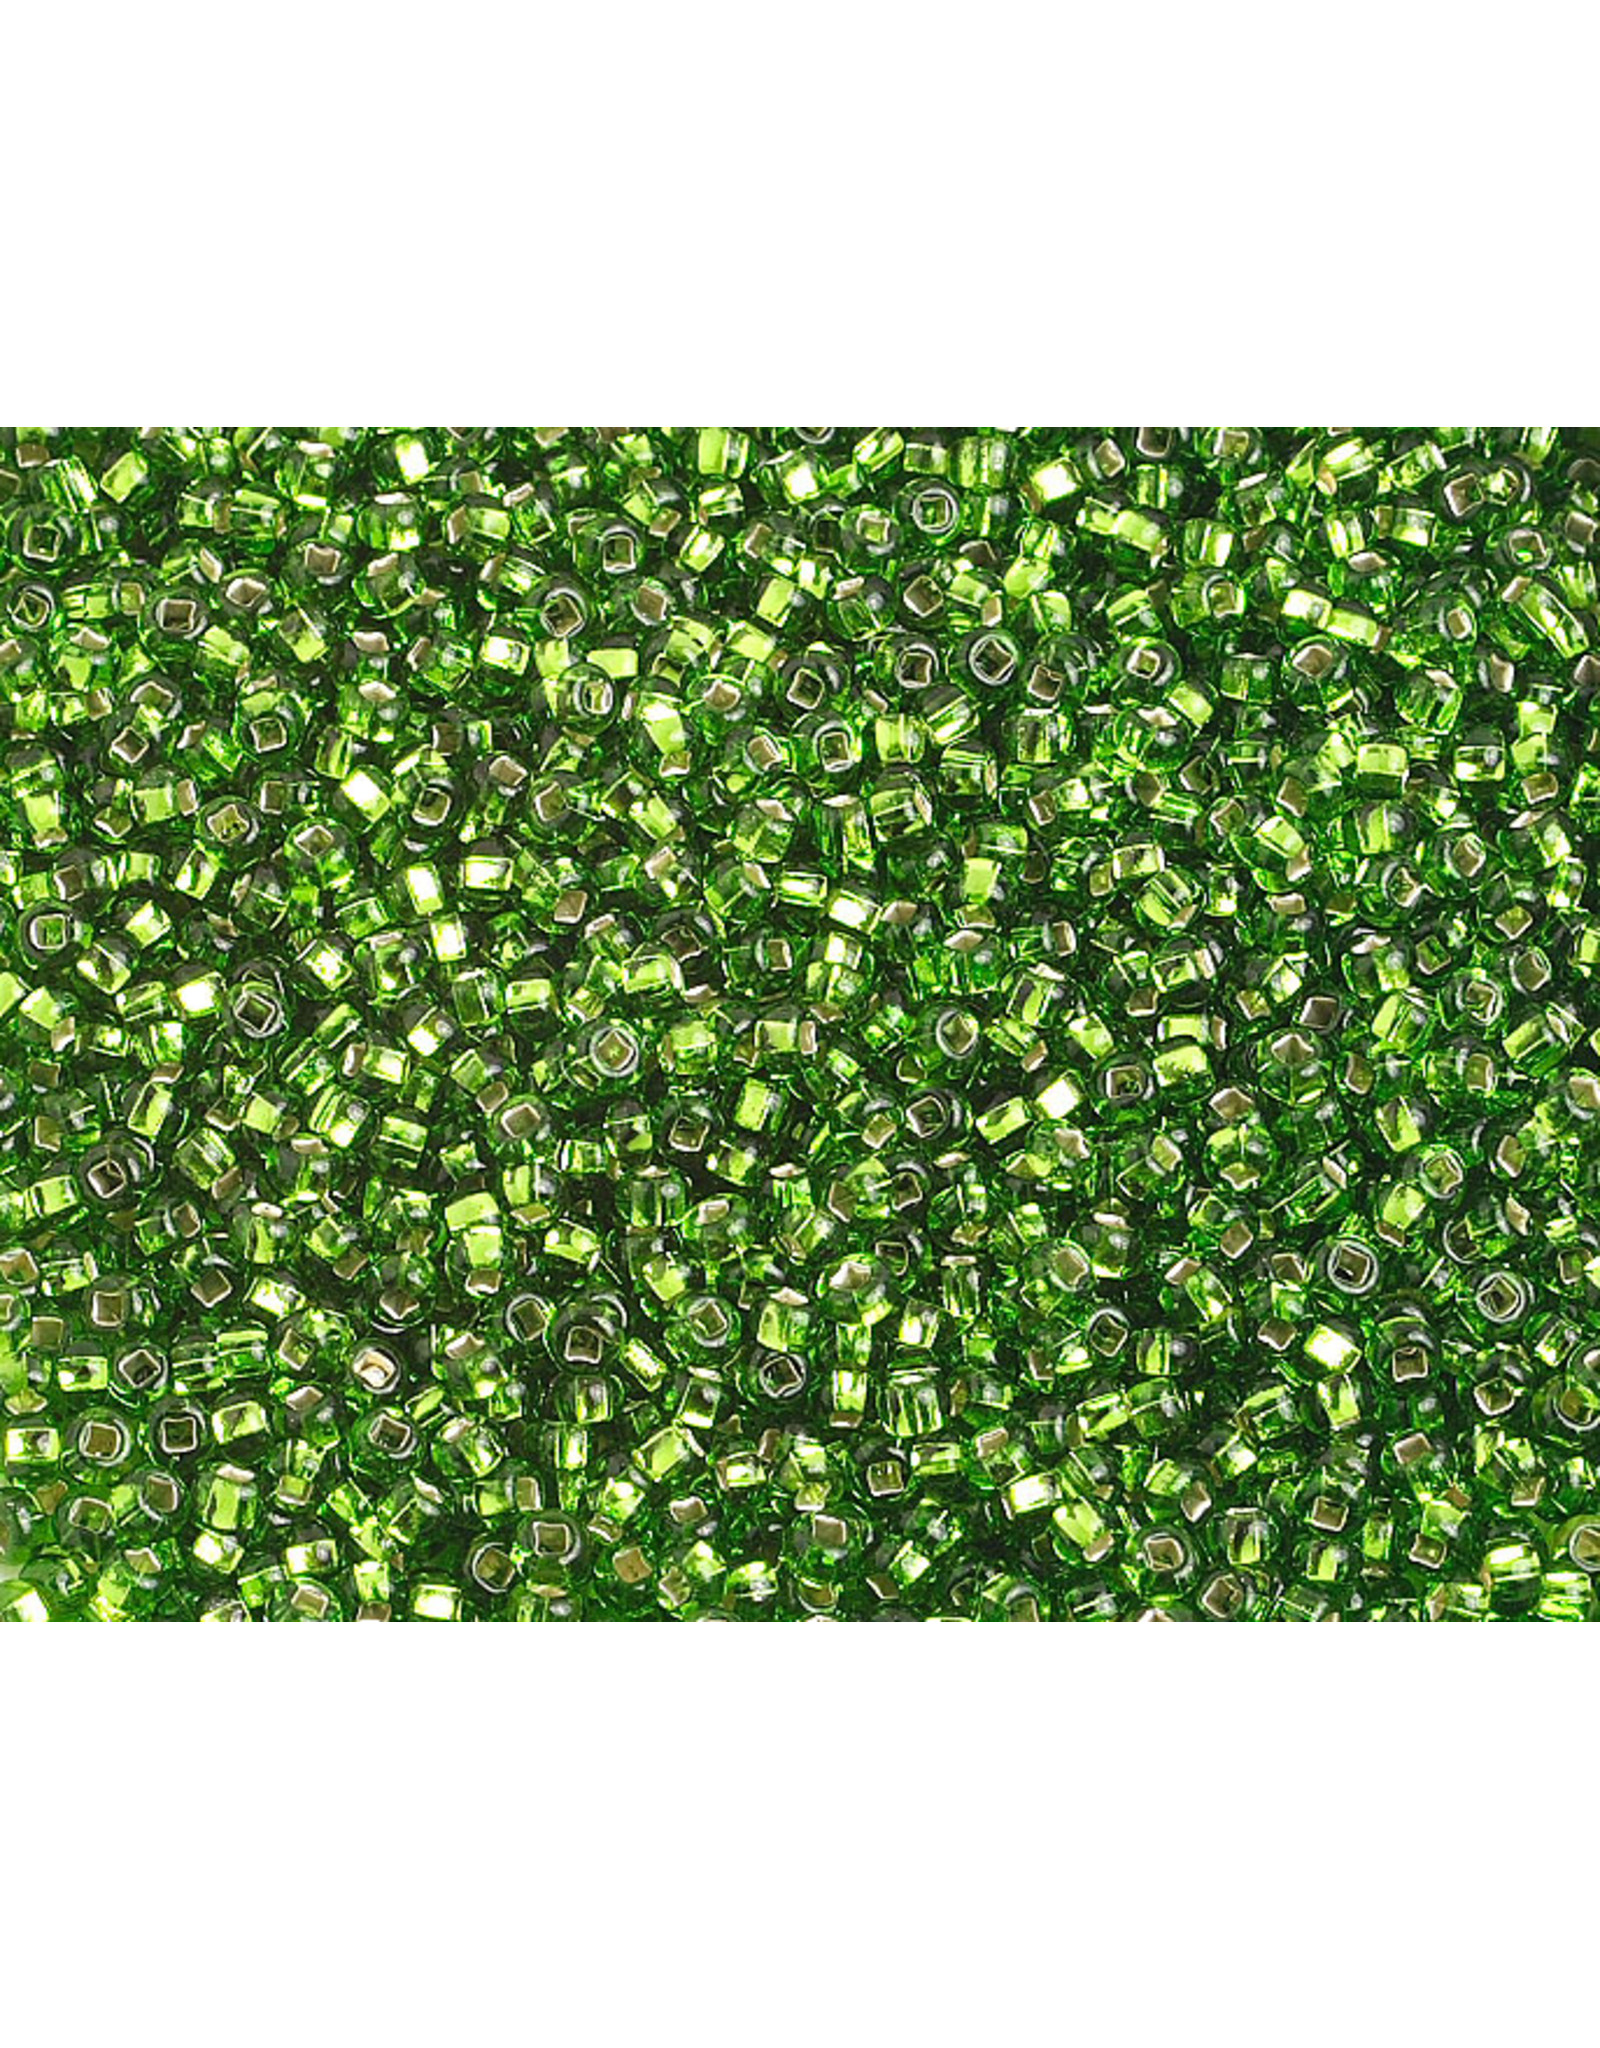 Czech 1288 10   Seed 20g Chartreuse Green  s/l